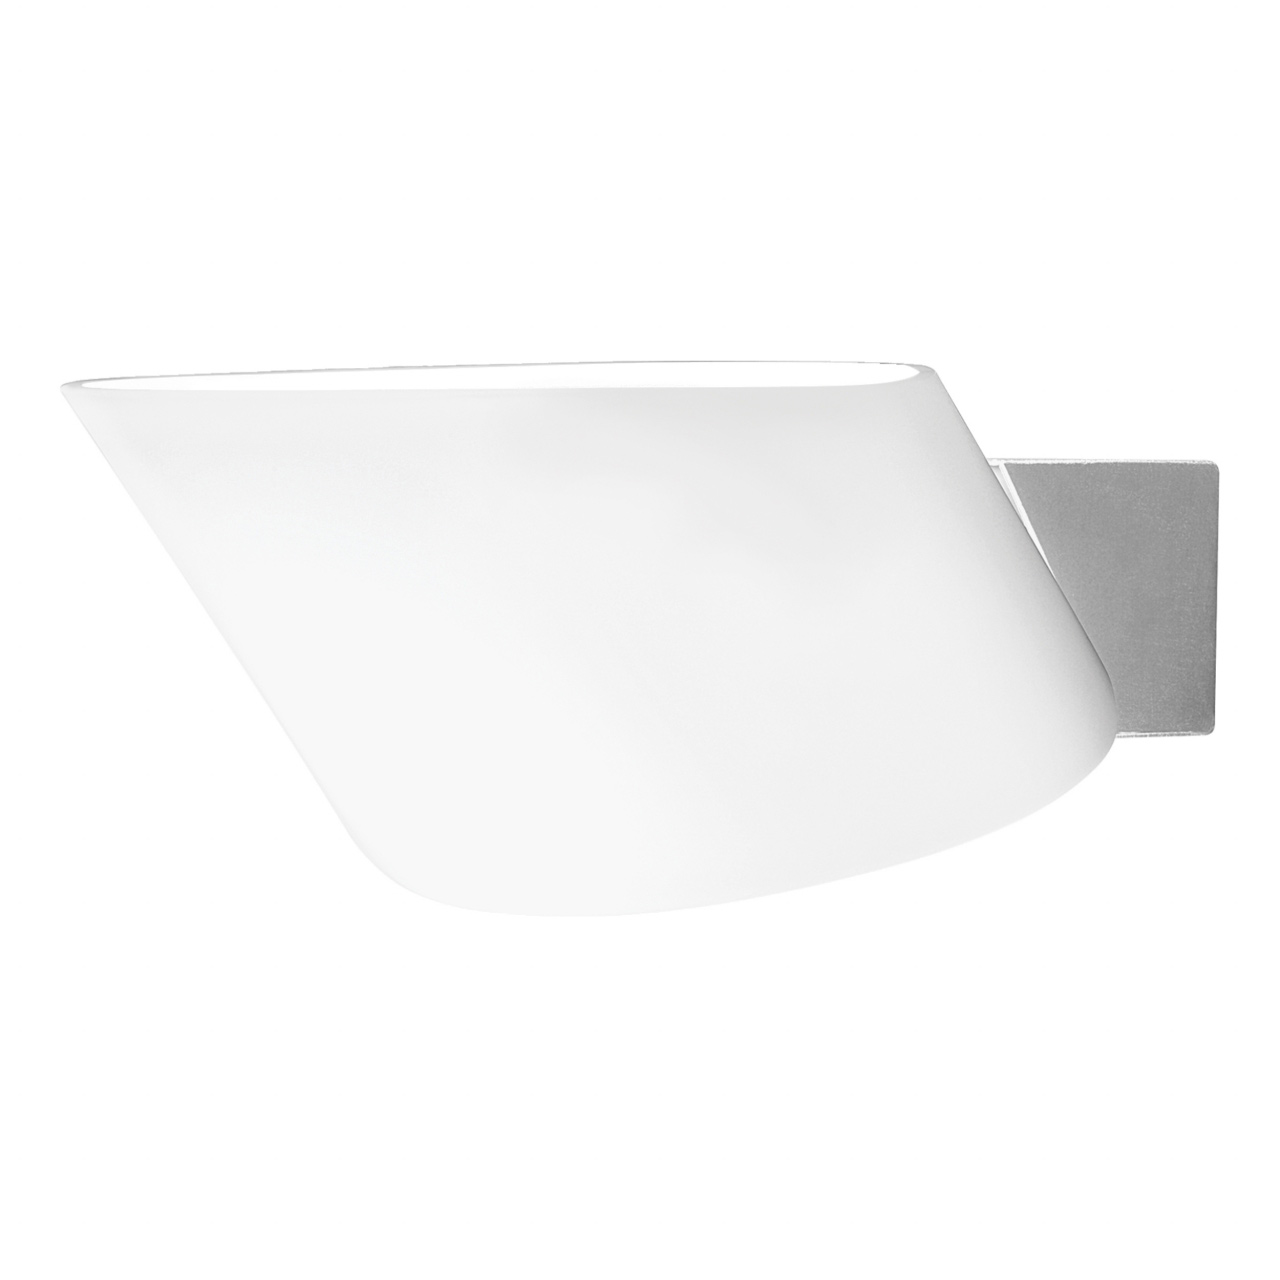 Светильник настенный Muro 1х150W R7s белый Lightstar 808630